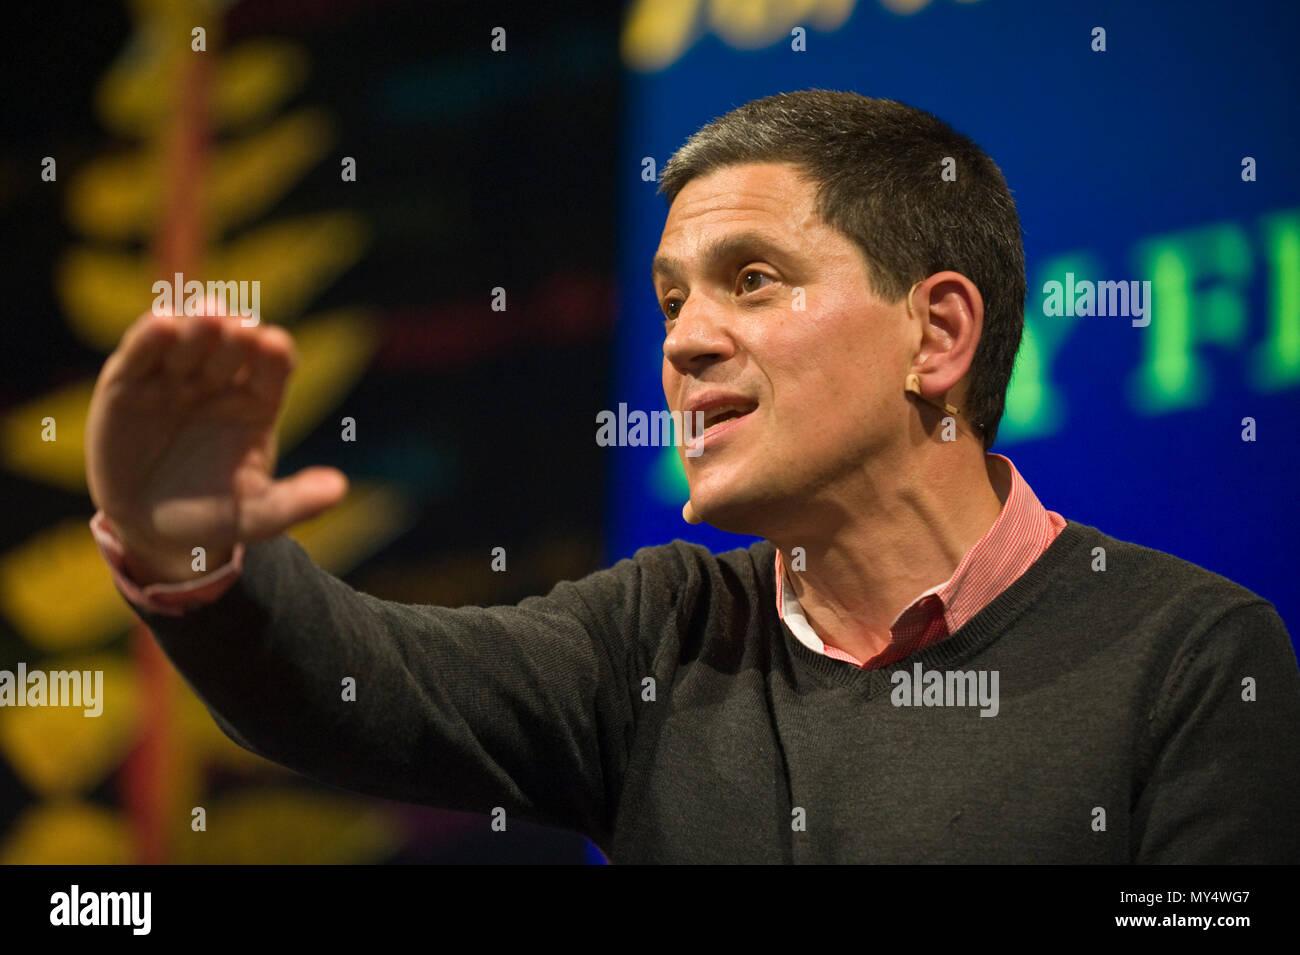 David Miliband speaking on stage at Hay Festival 2018 Hay-on-Wye Powys Wales UK Stock Photo